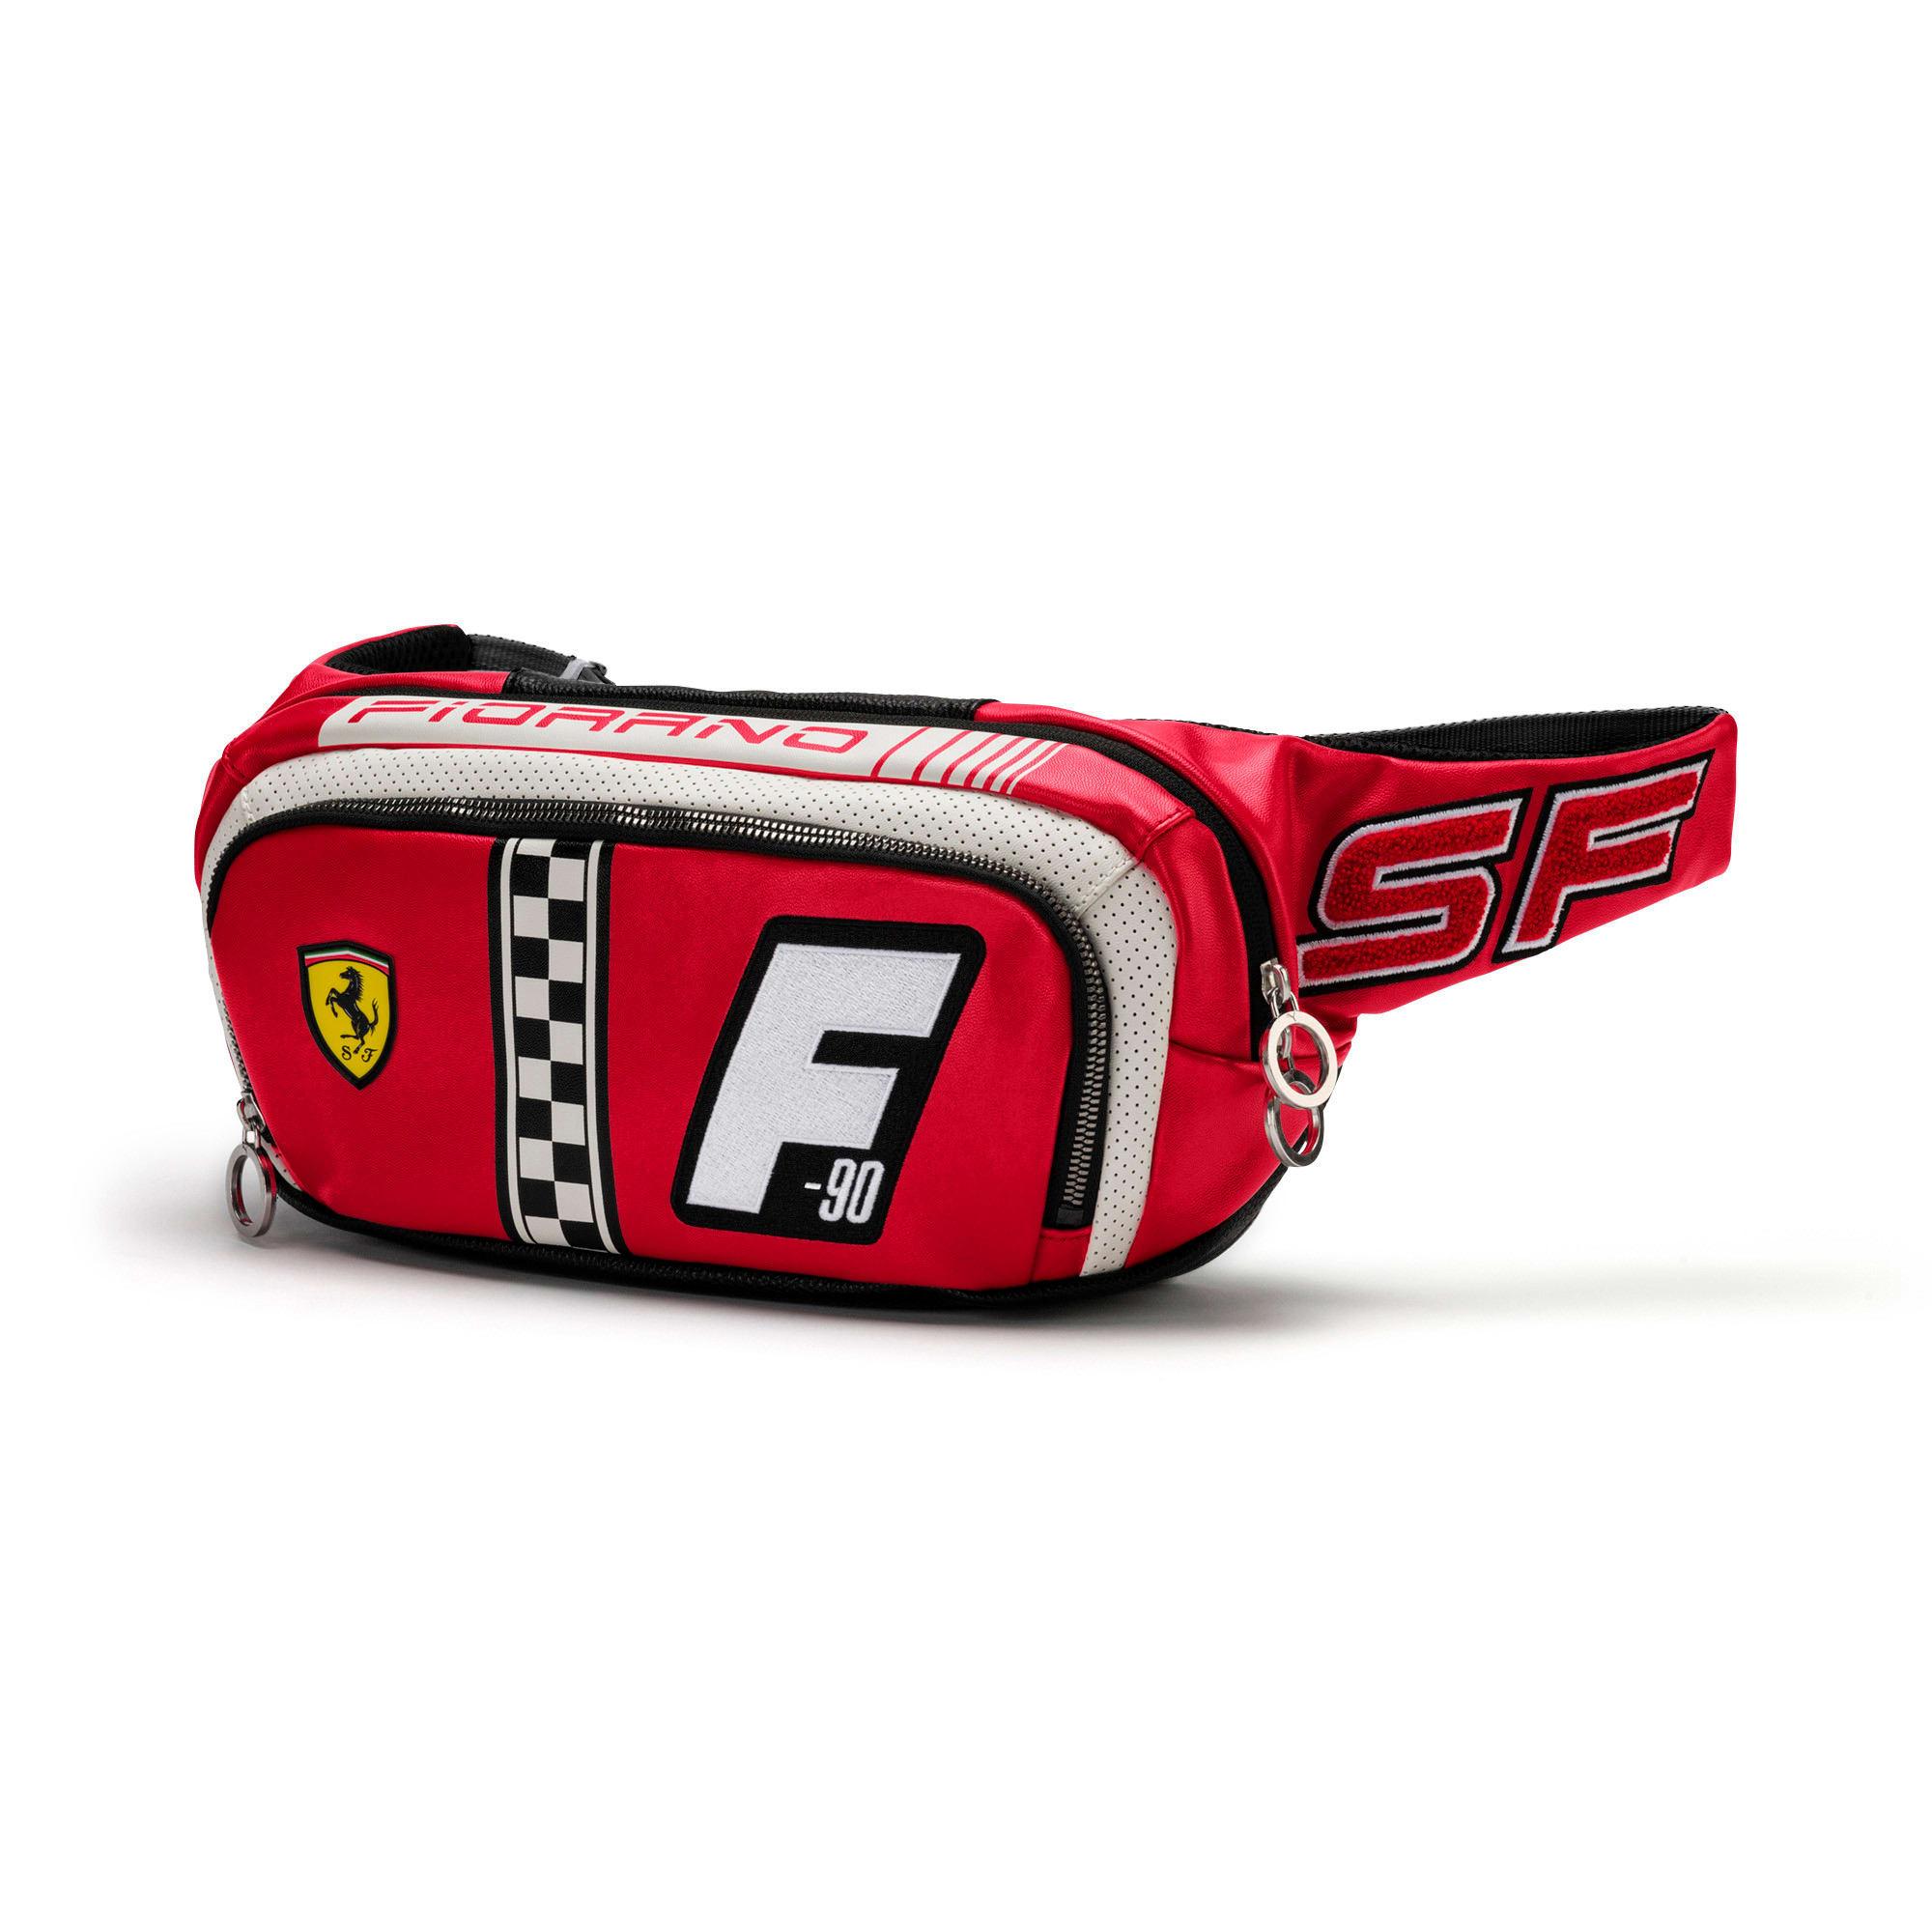 Thumbnail 1 of Ferrari Cat Crossbody Tasche, Rosso Corsa, medium